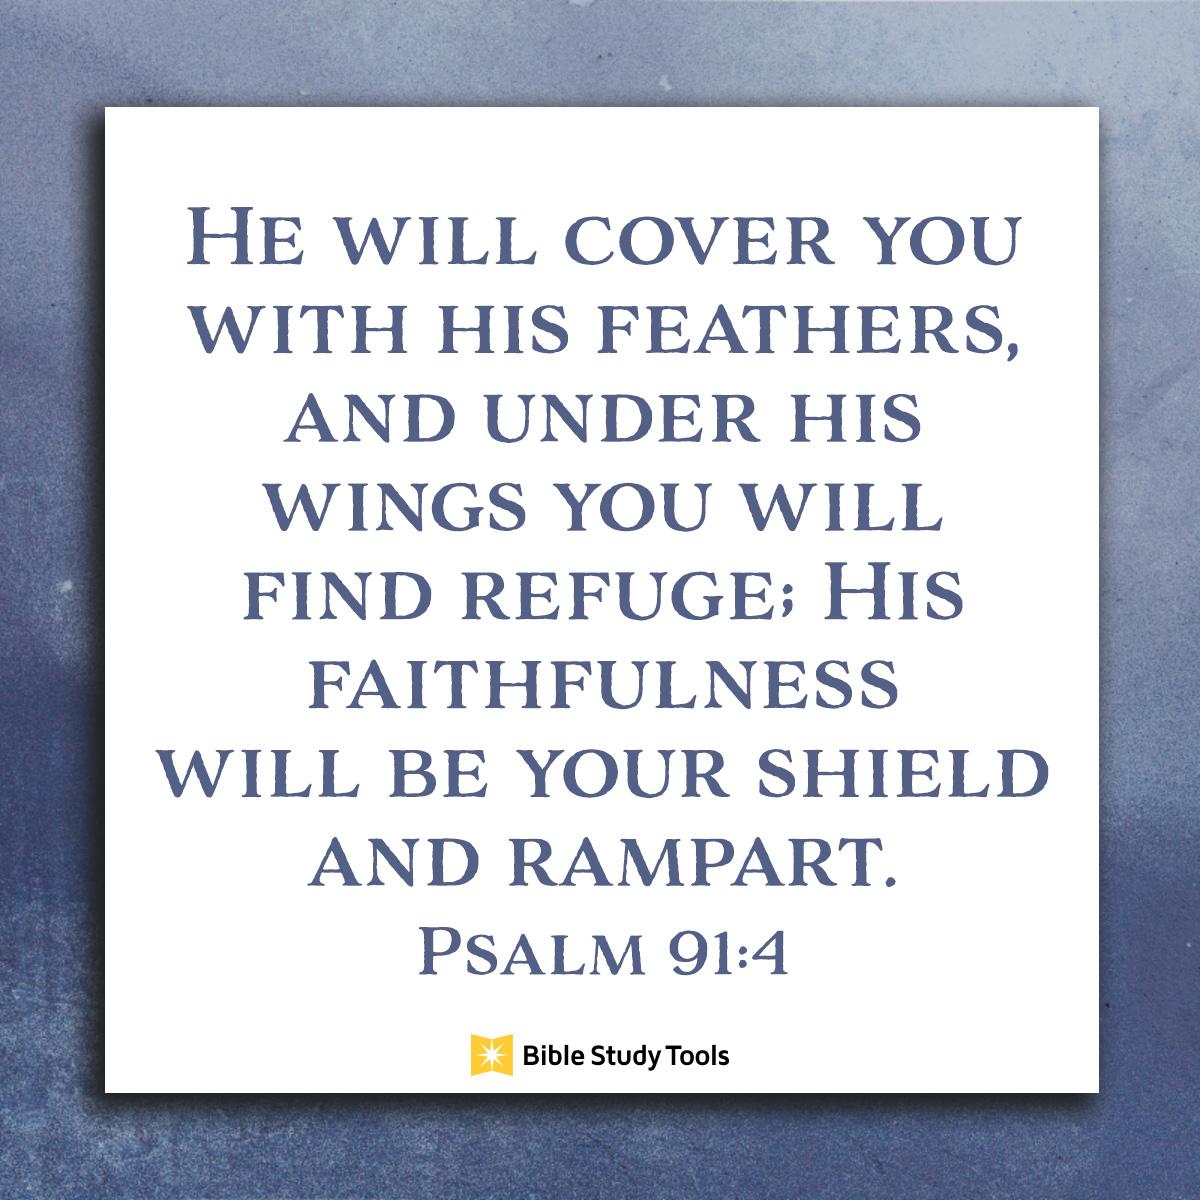 Psalm 91:4, inspirational image